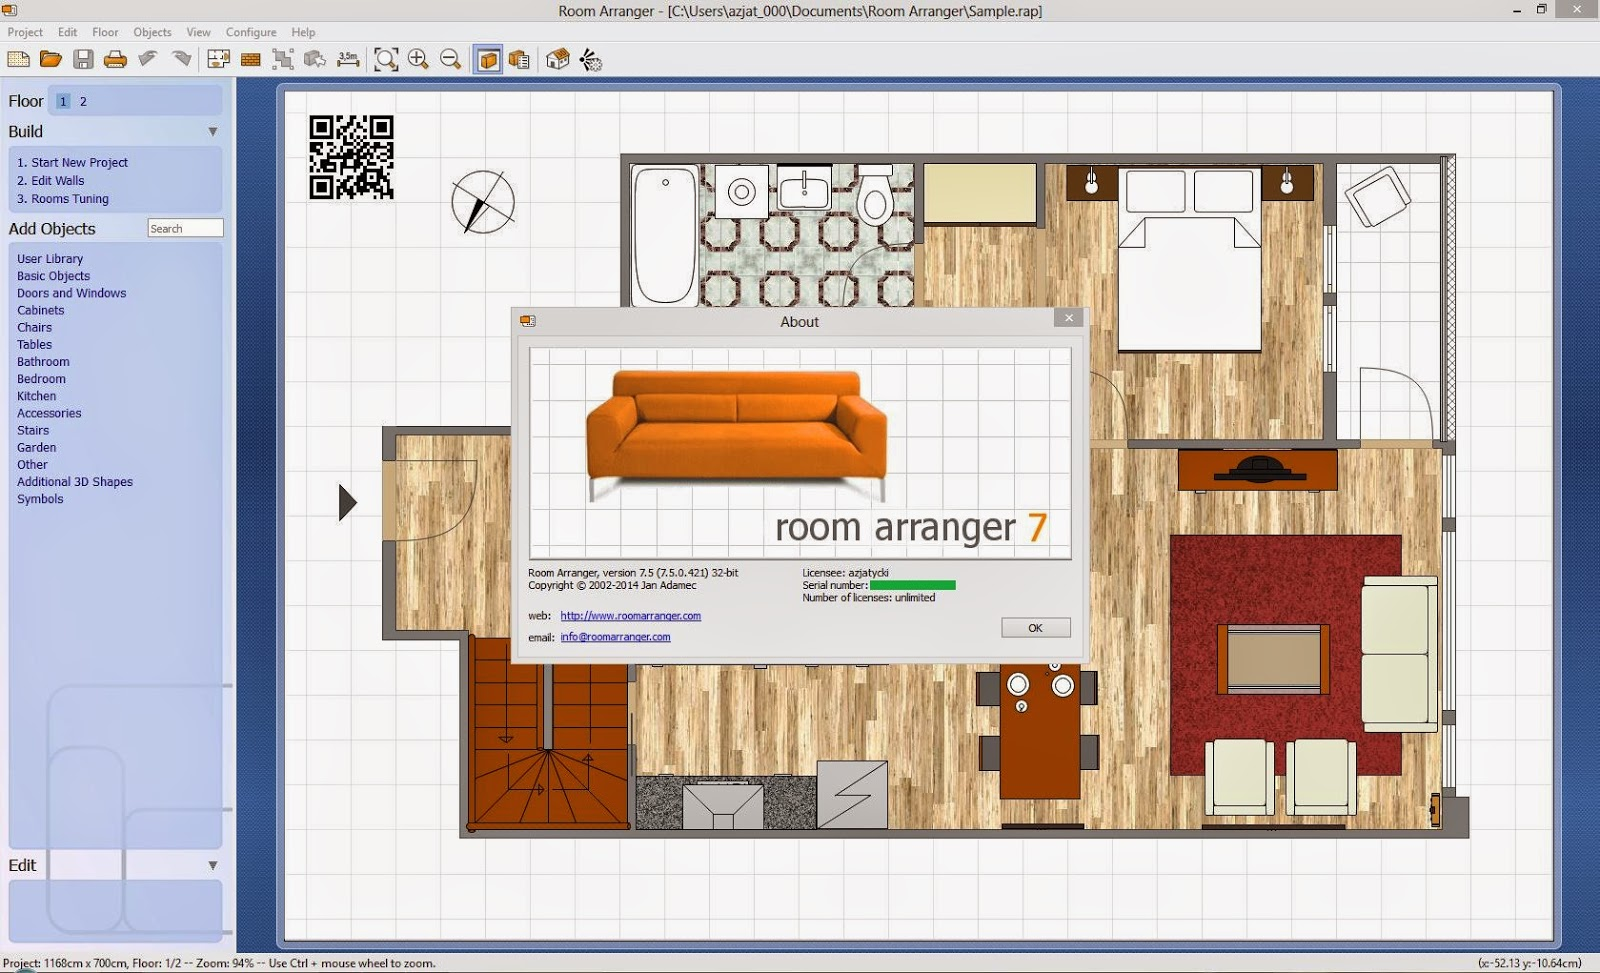 Room arranger 7 5 32 64 bit serials room arranger for Room arranger